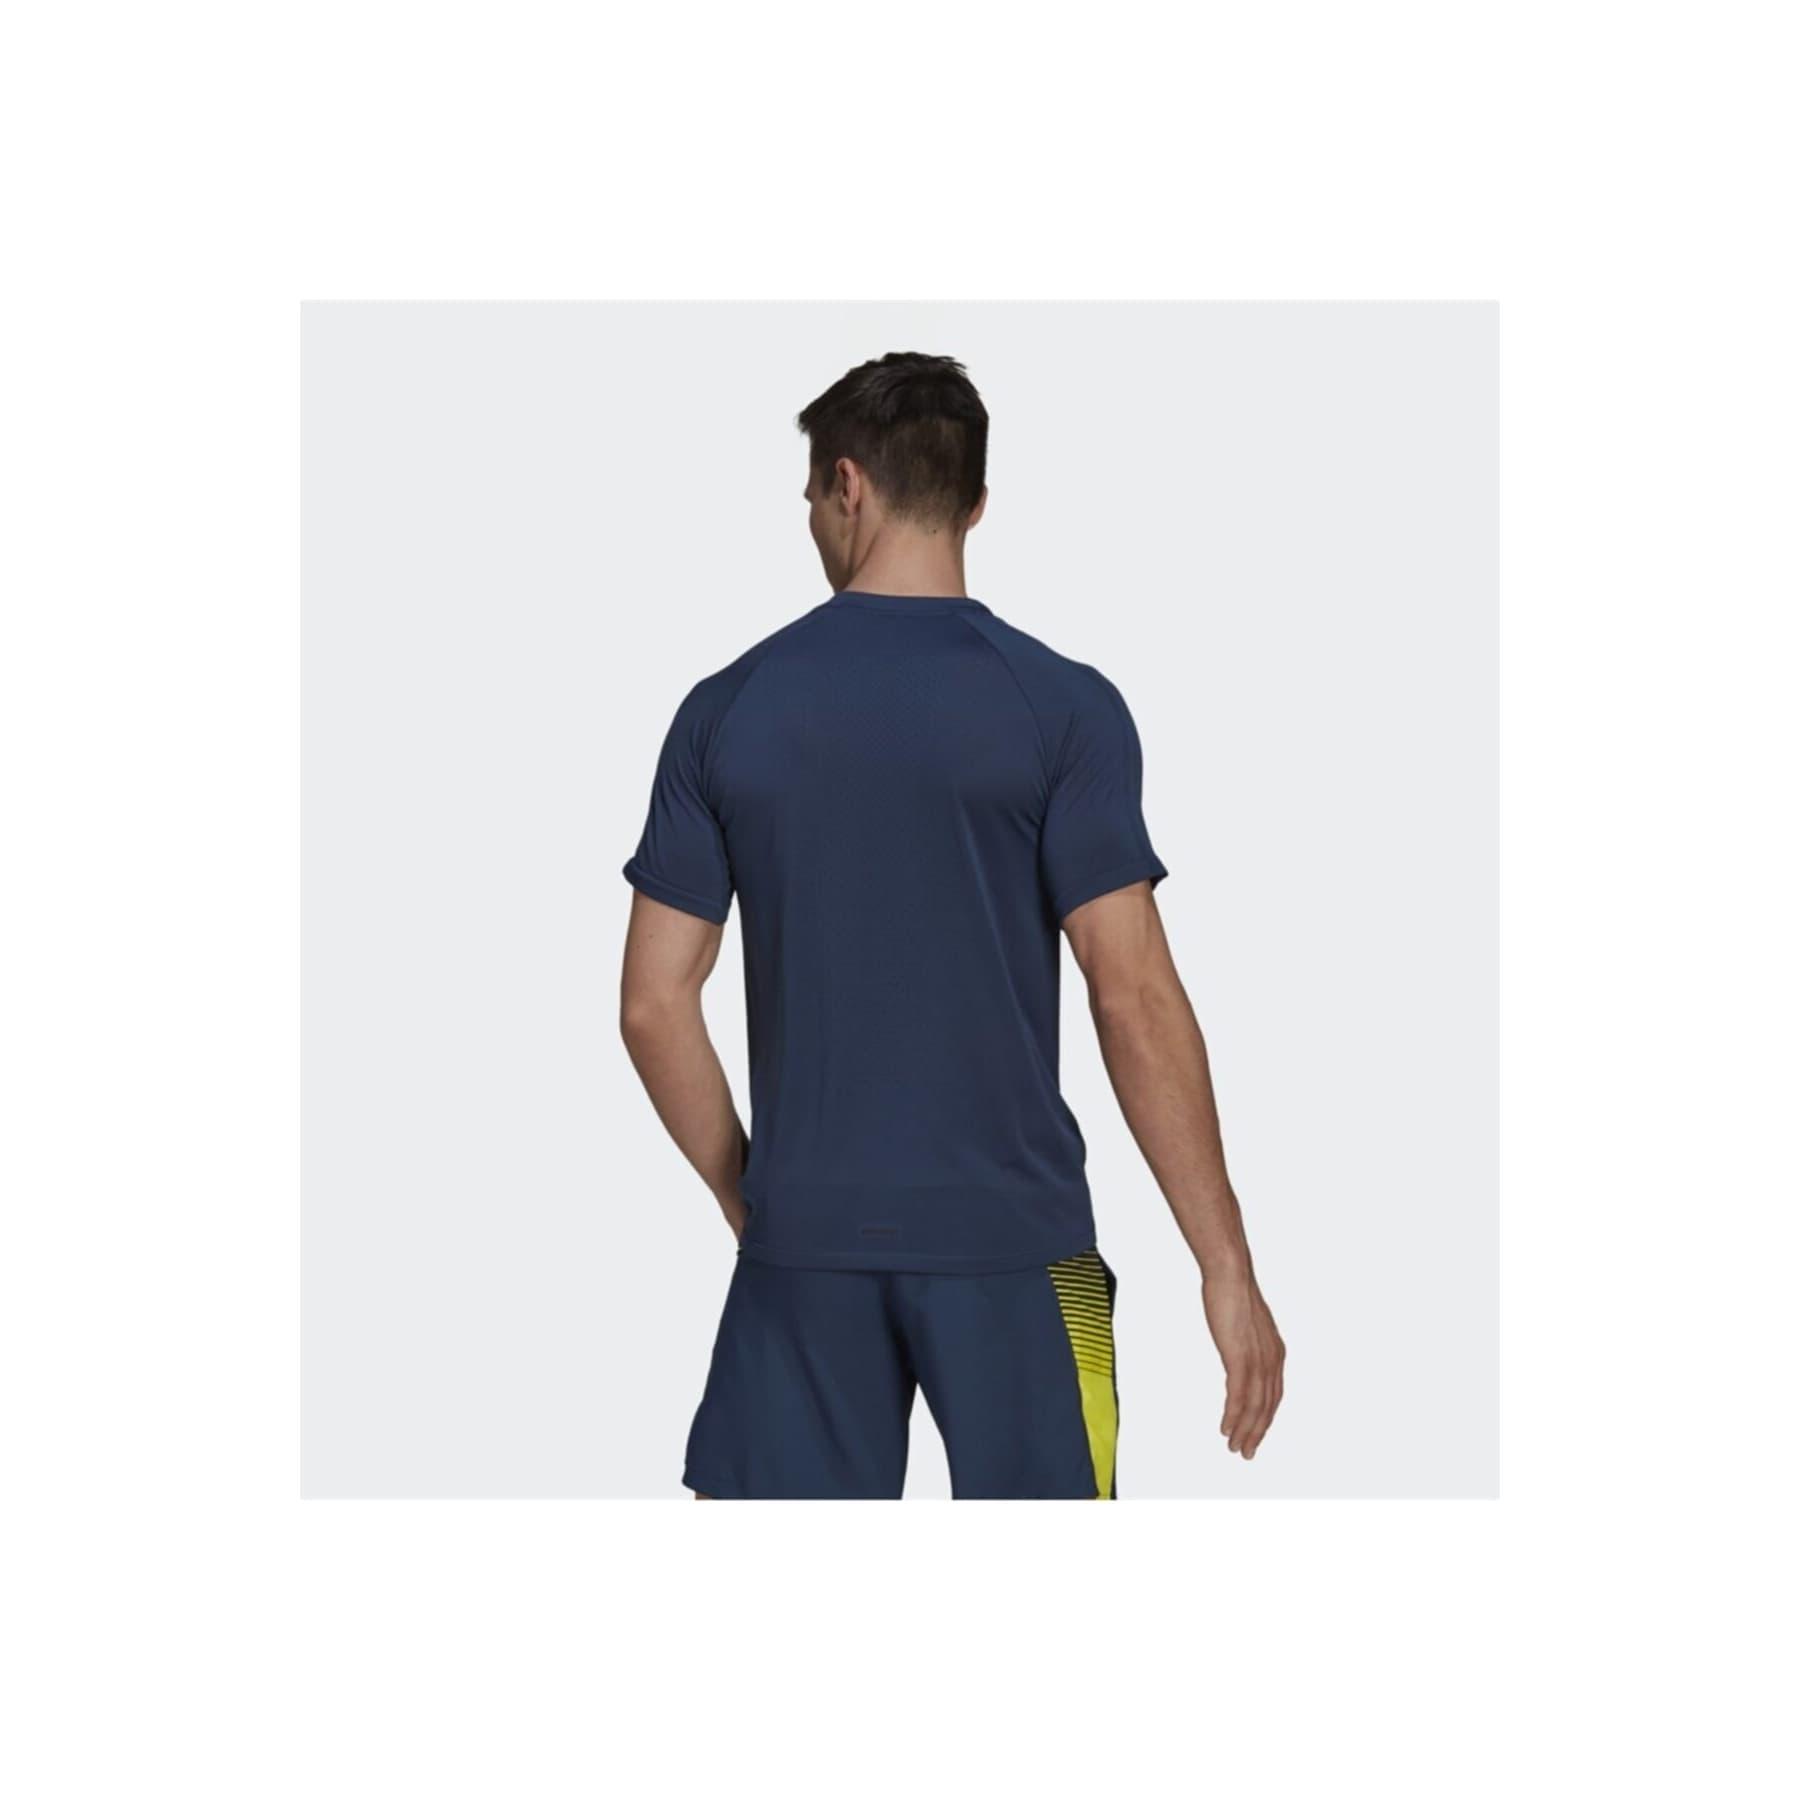 Aeroknit Designed 2 Move Sport Seamless Tişört (GM2086)